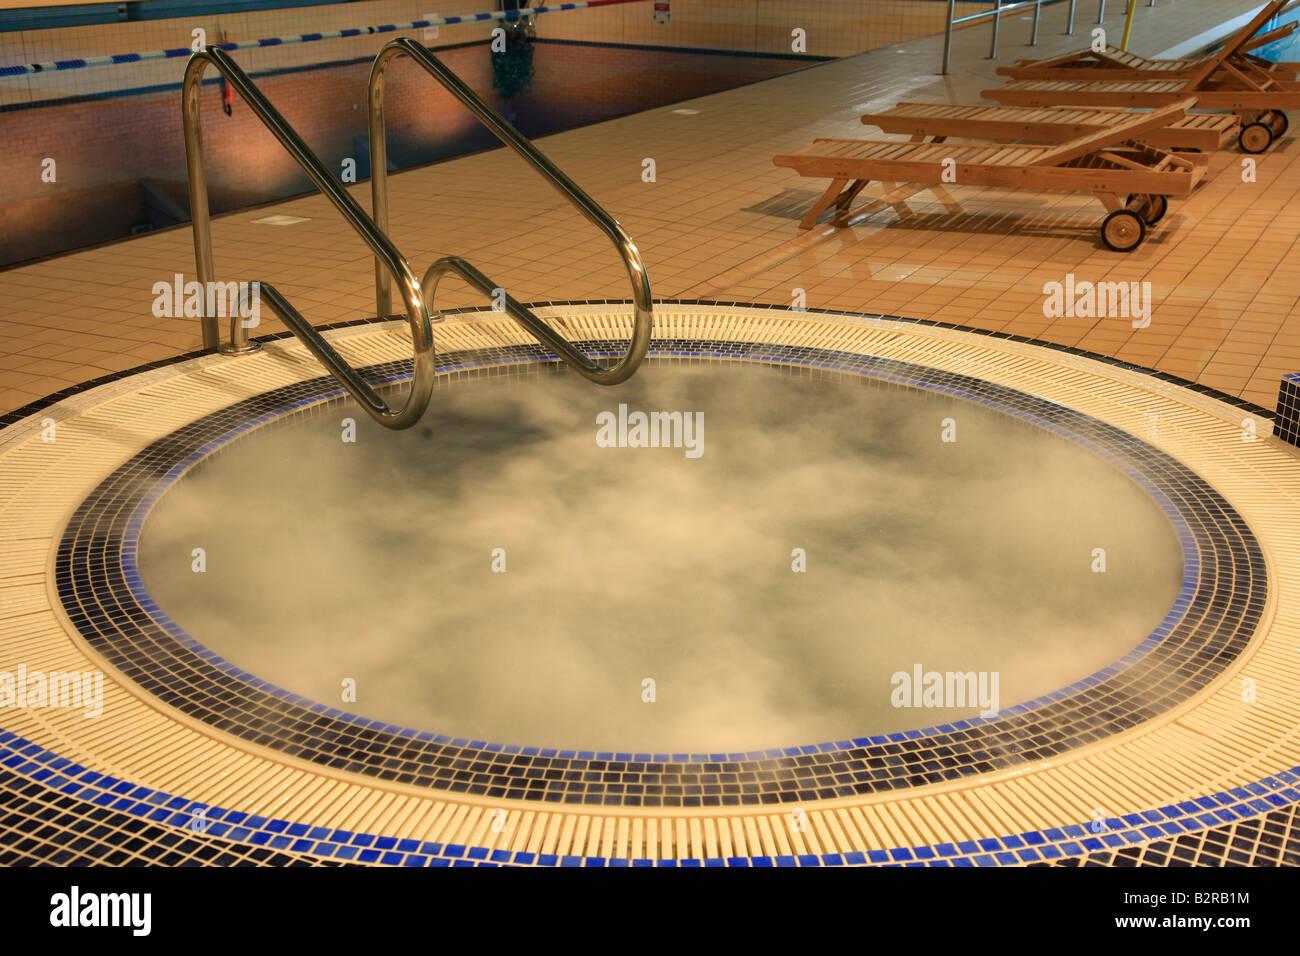 Indoor whirlpool Jacuzzi in an Esporta Spa Gym England Britian UK ...